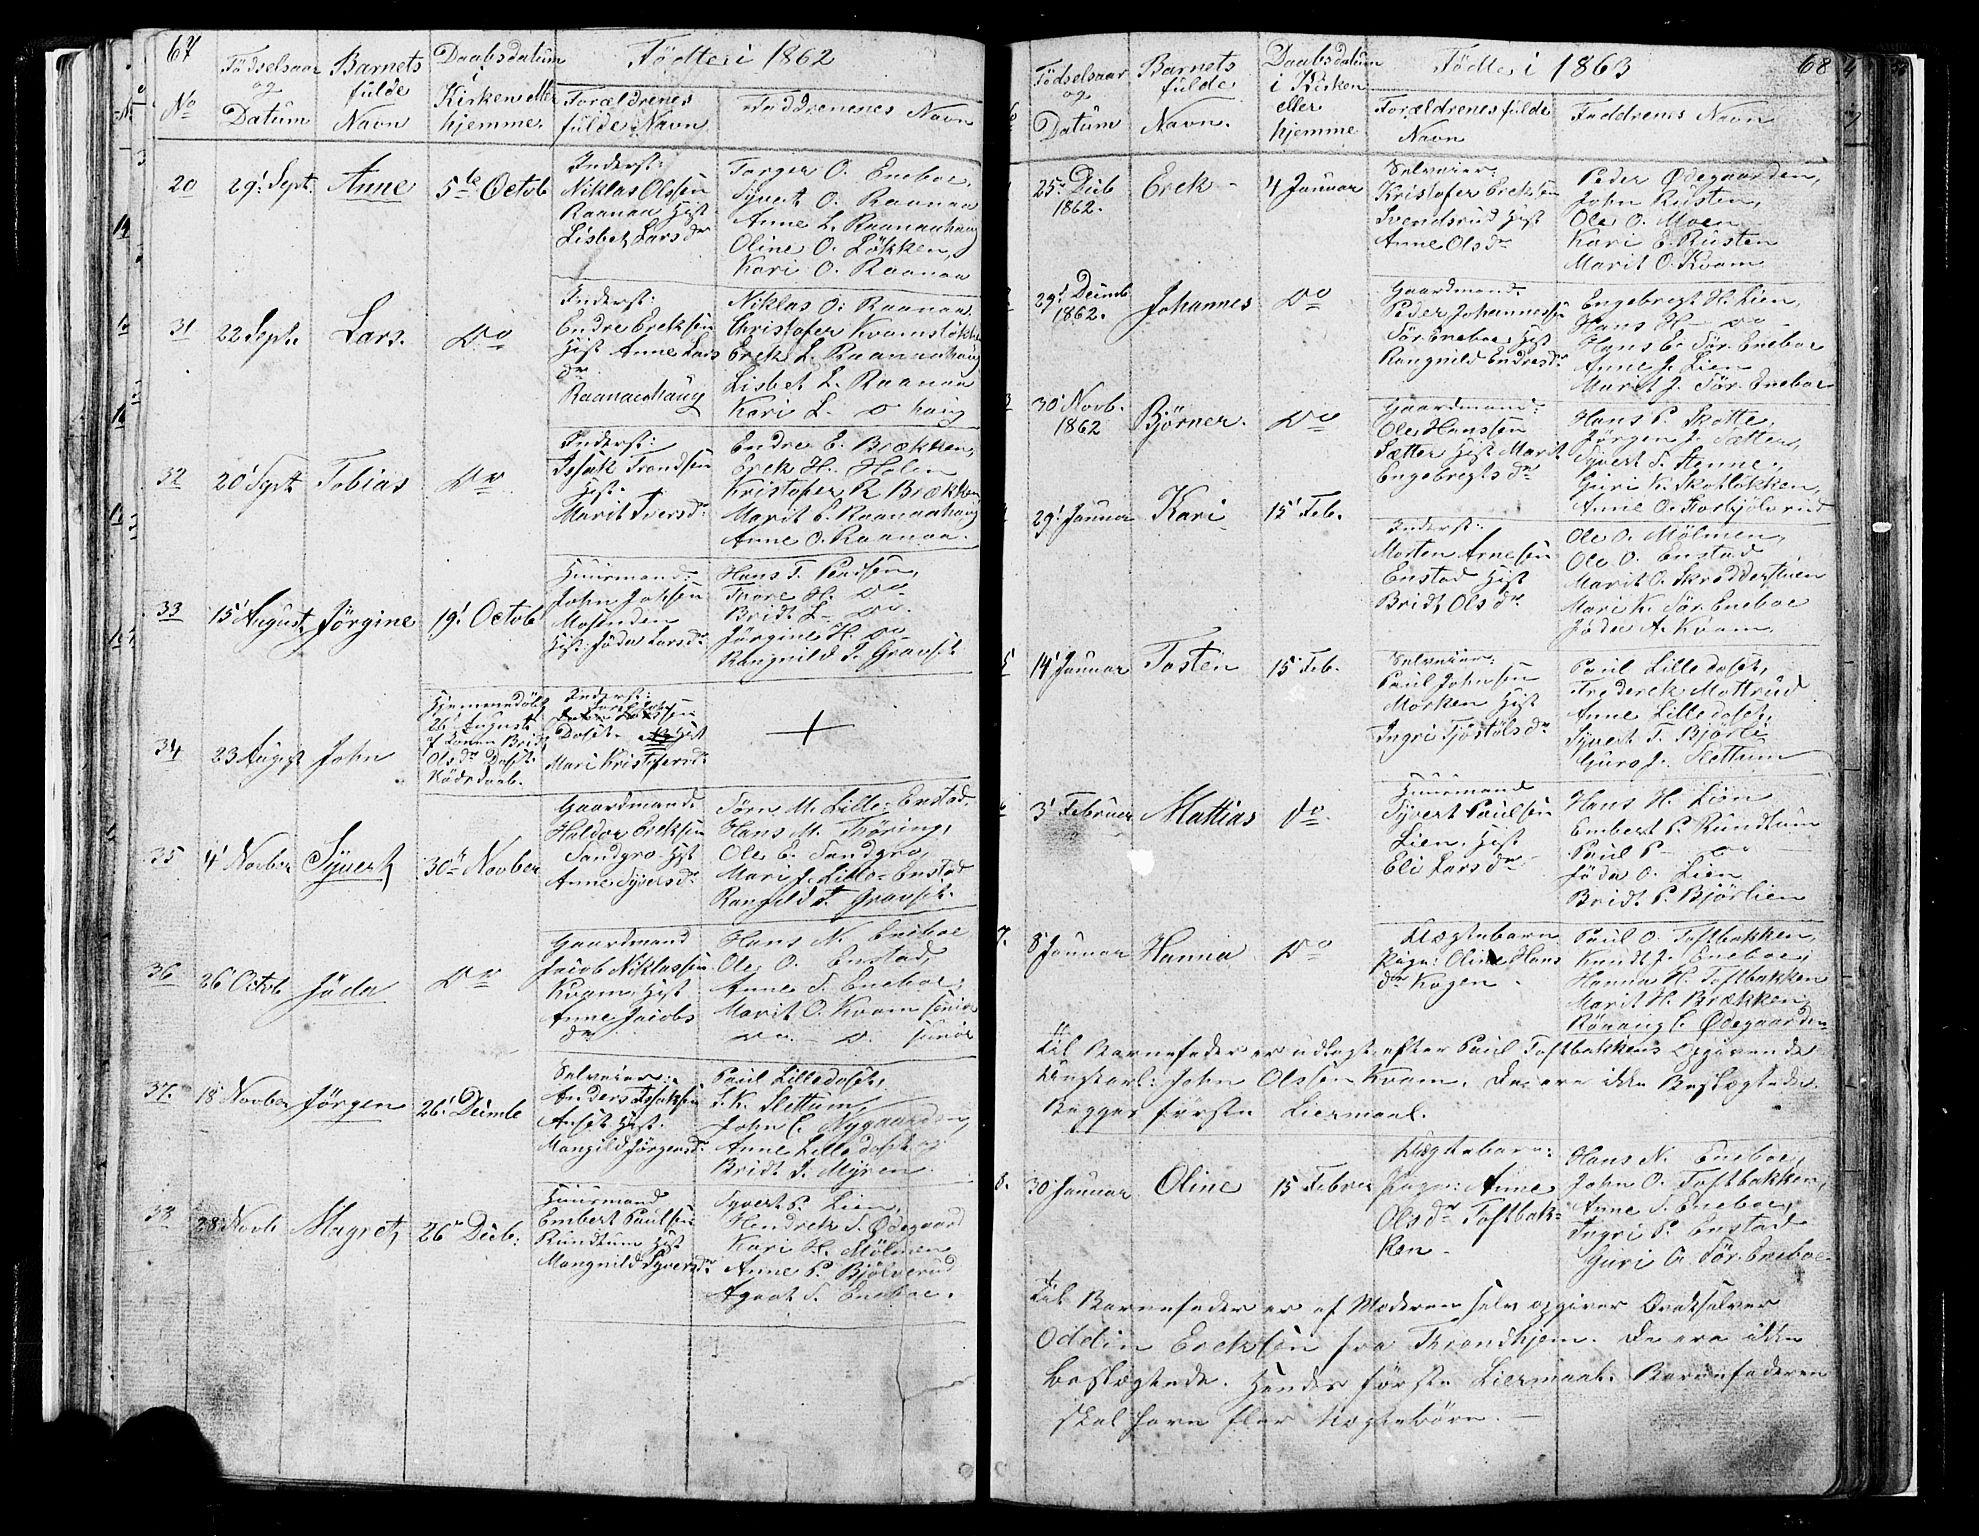 SAH, Lesja prestekontor, Klokkerbok nr. 4, 1842-1871, s. 67-68